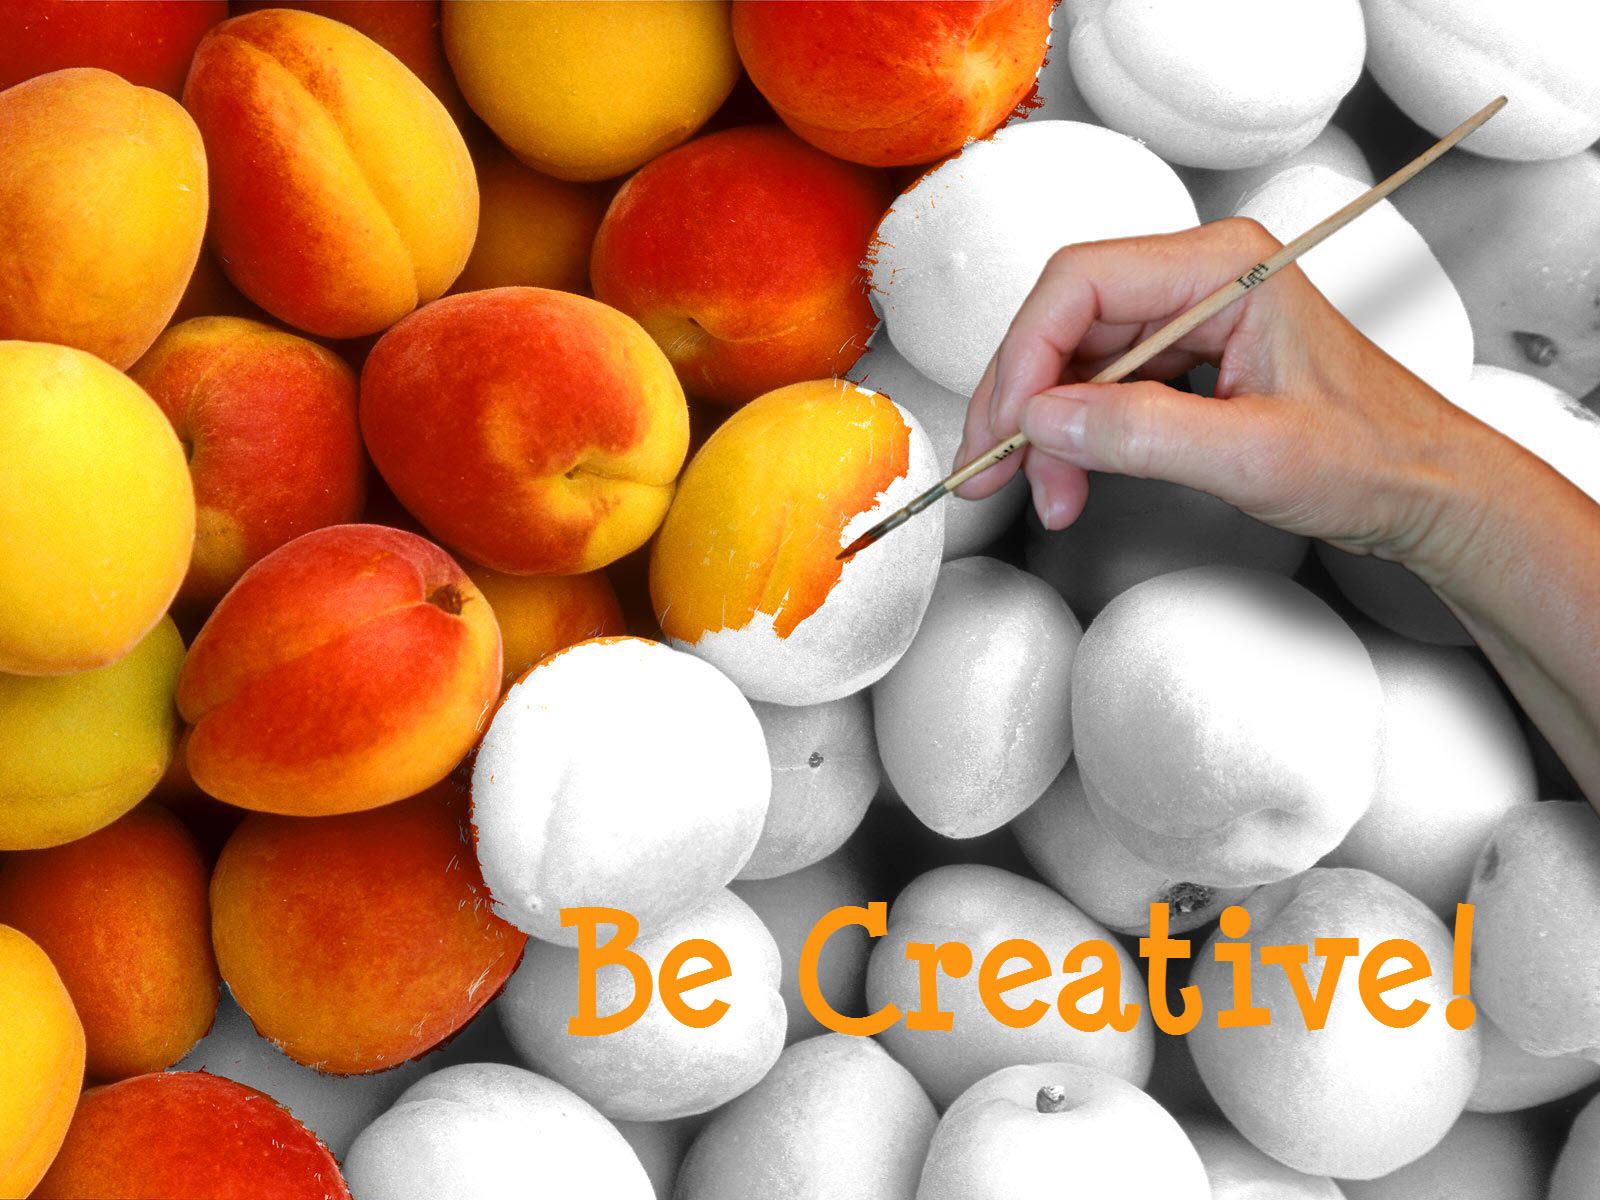 be-creative-exchange-ideas-orlando-espinosa